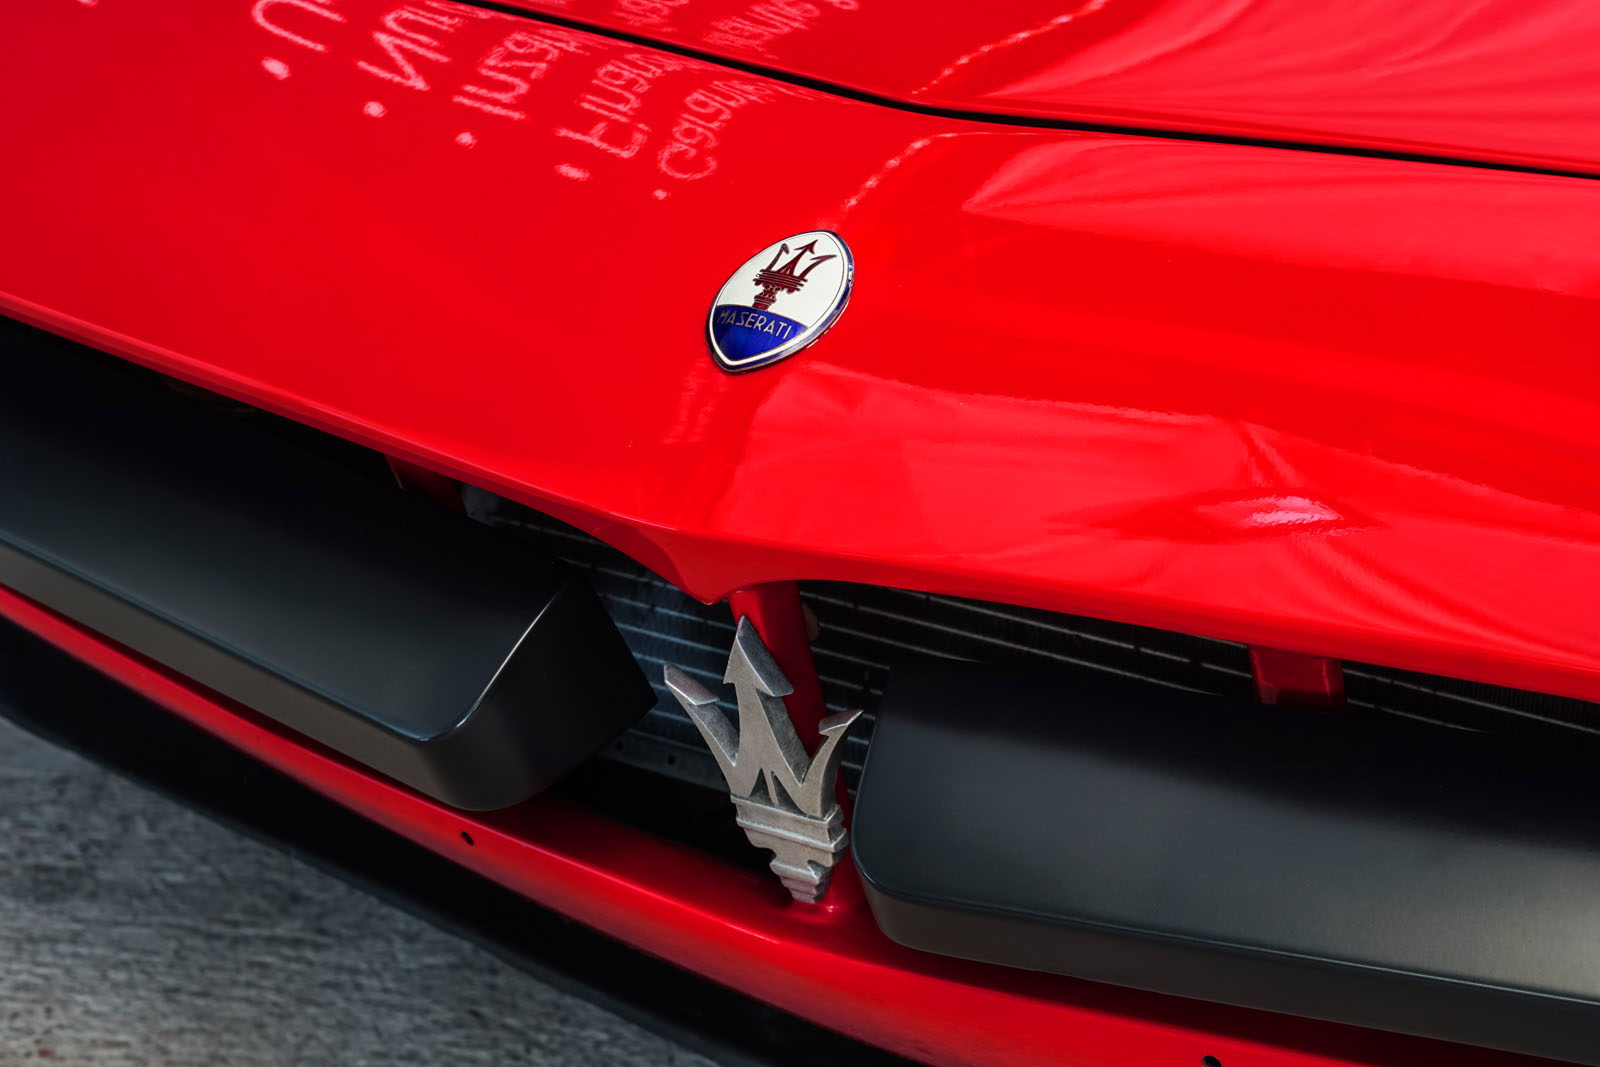 Maserati_Merak_Rot_Schwarz_MAS-4094_10_w